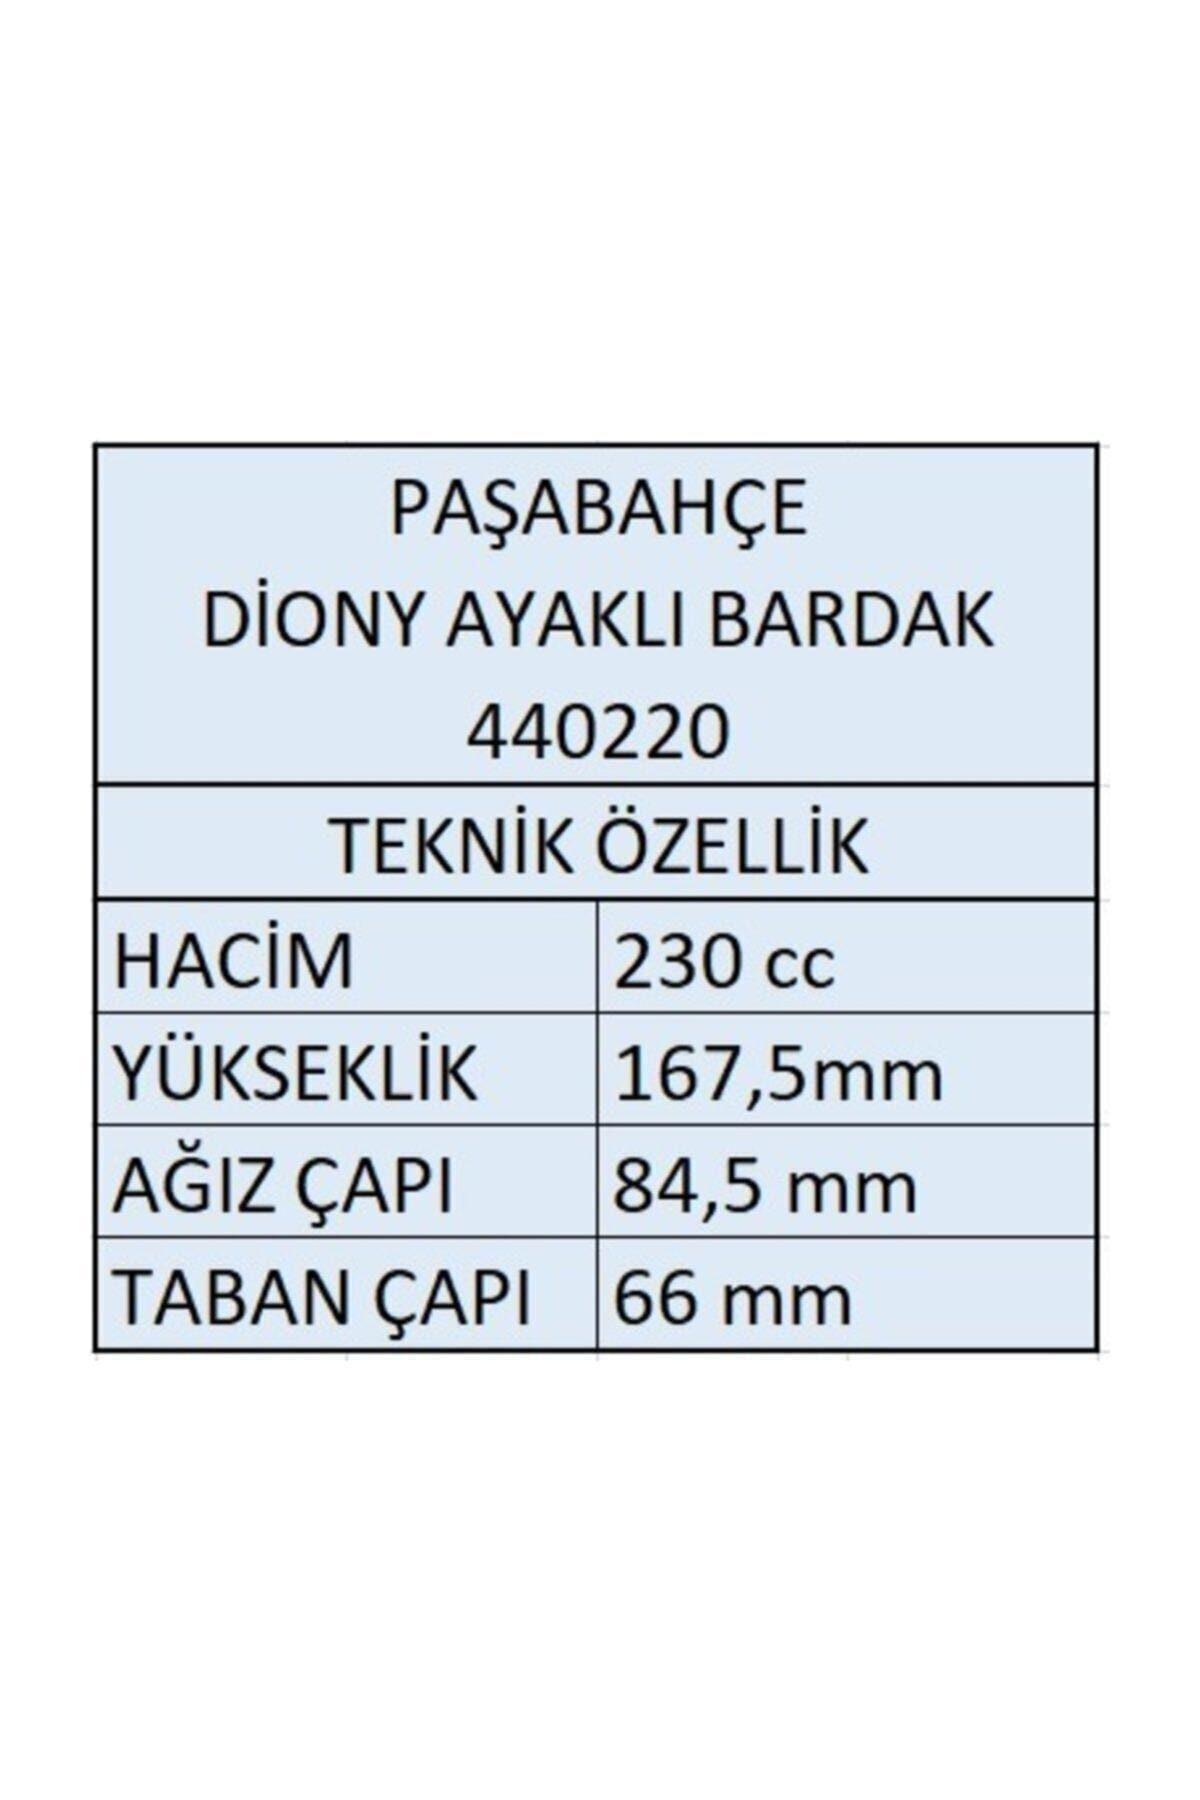 Paşabahçe Diony Kadeh Ayaklı Bardak - 12 Adet 440220